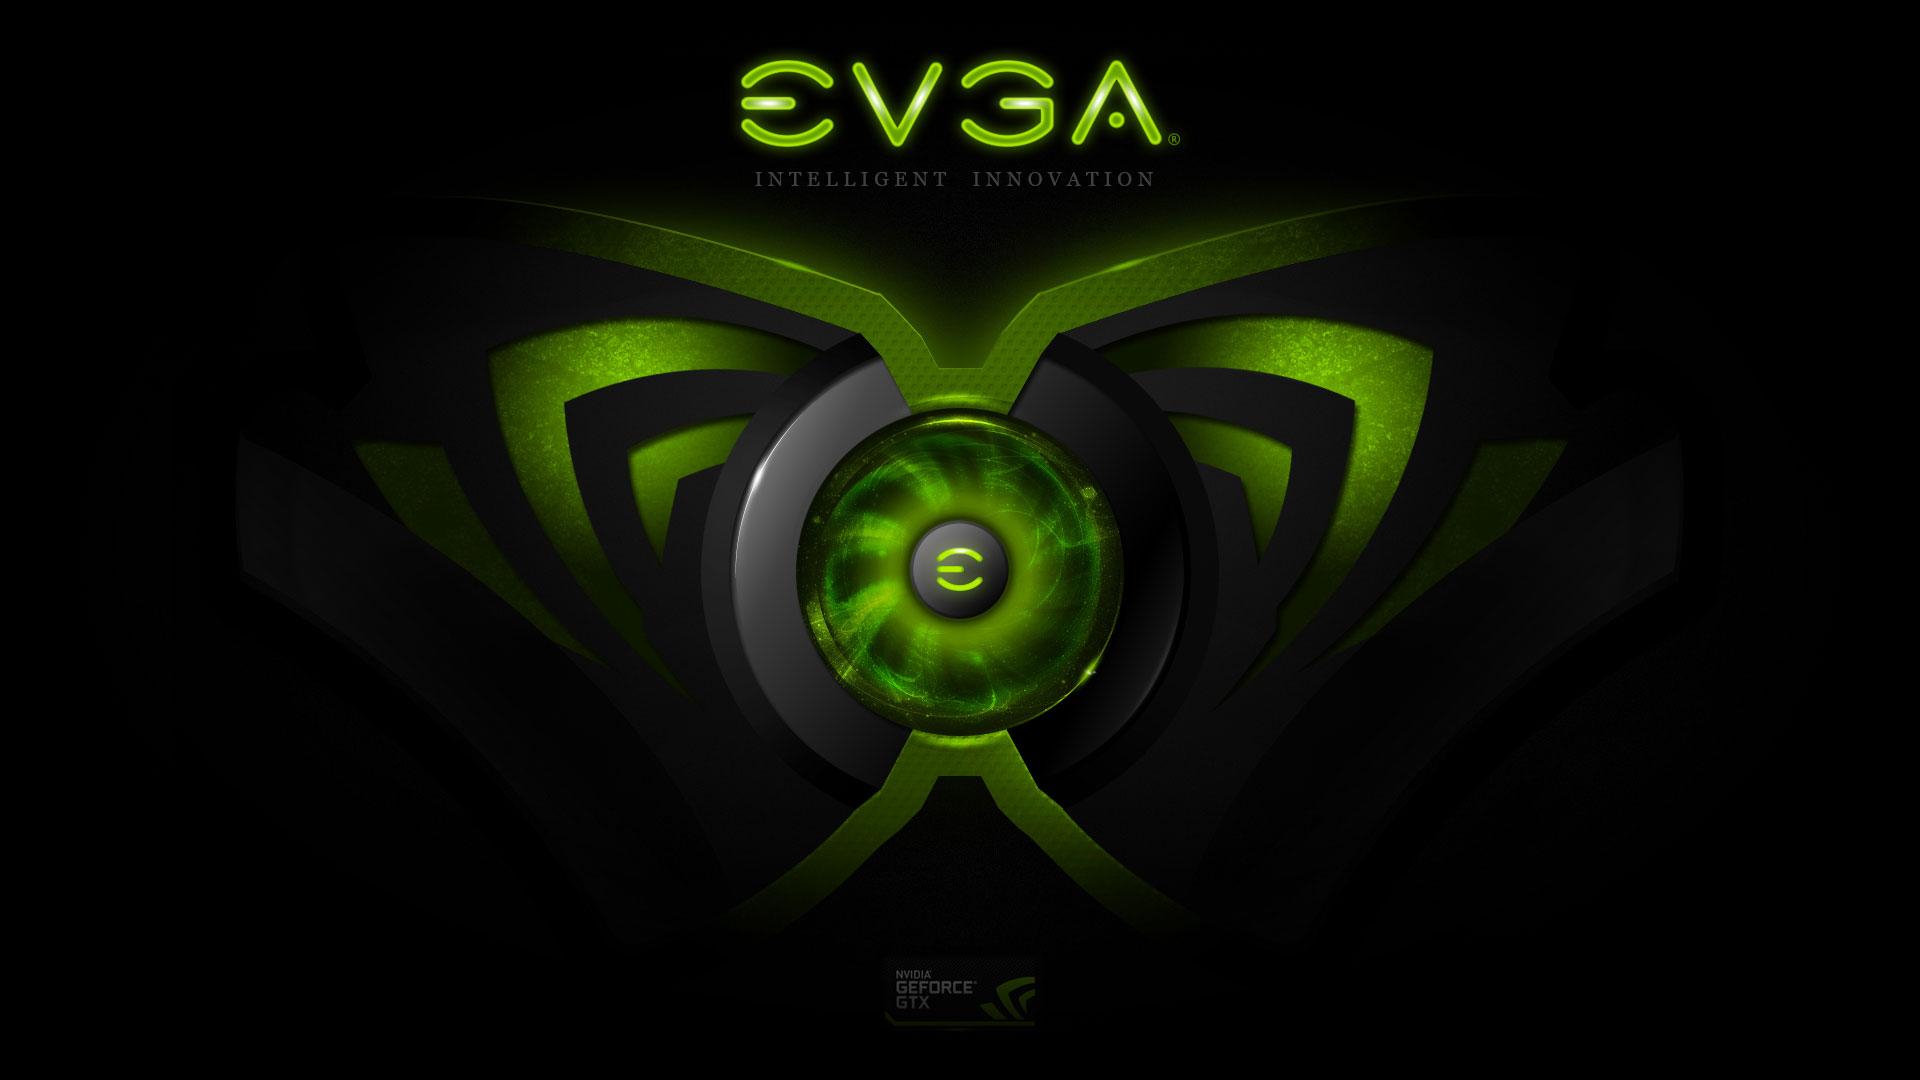 EVGA - XIII - Anniversary Wallpaper Contest 2012